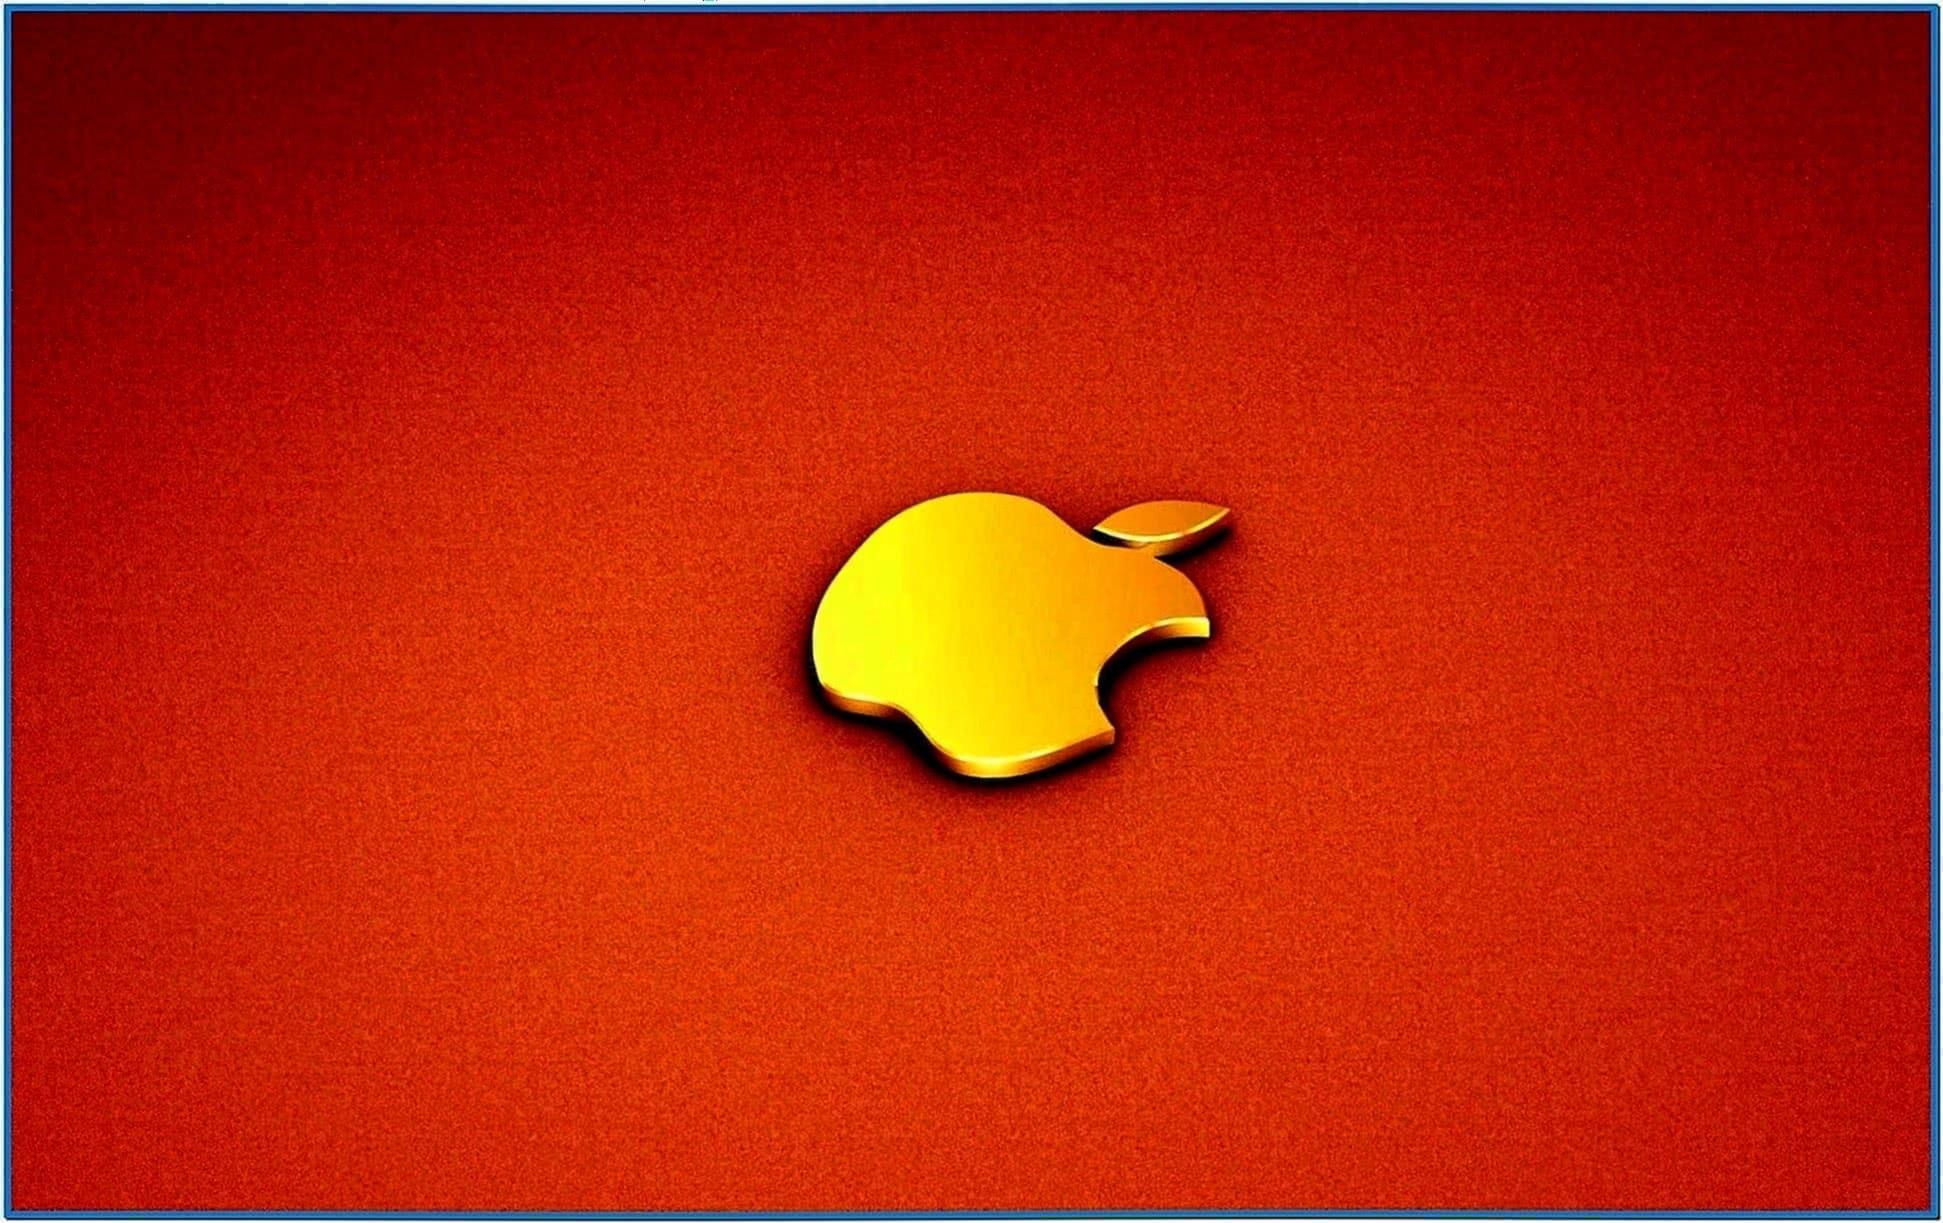 MacBook Pro Screensavers 2020